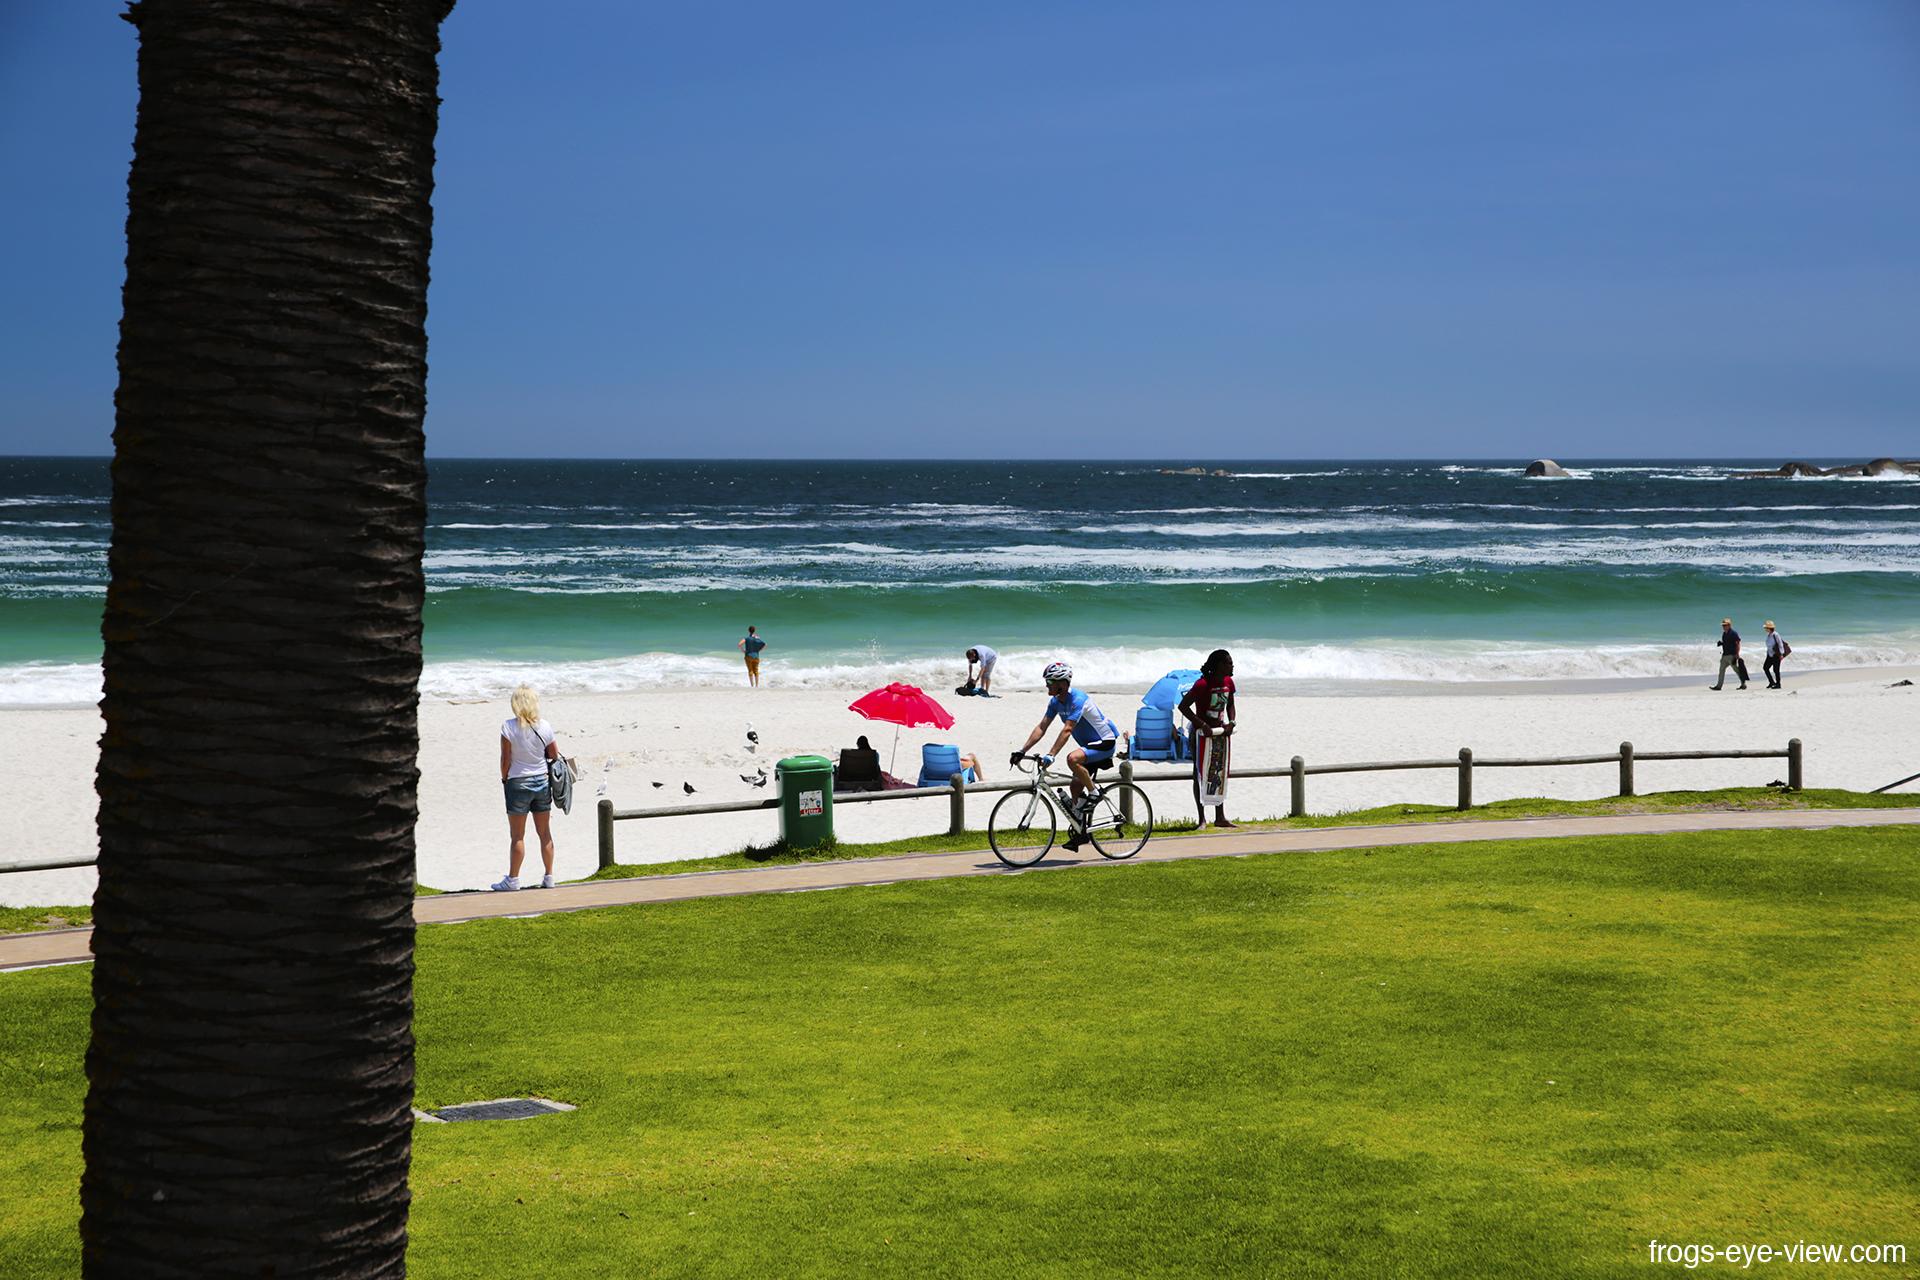 20160115_Afrika_151109-05_Capetown_MG_8253 Kopie